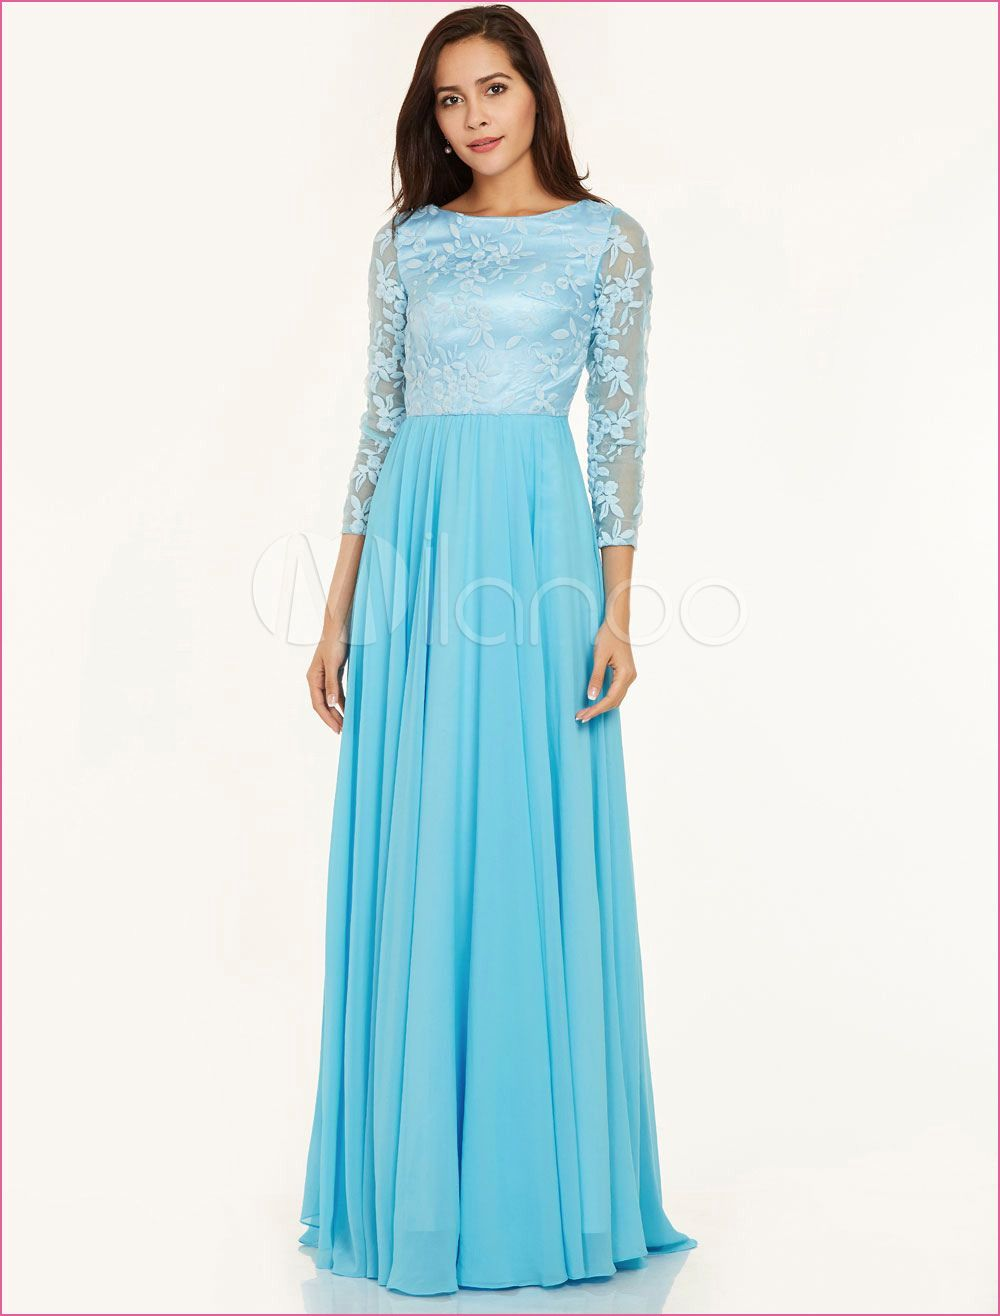 100 gambar kleider terbaik | gaun pengantin pantai, gaun